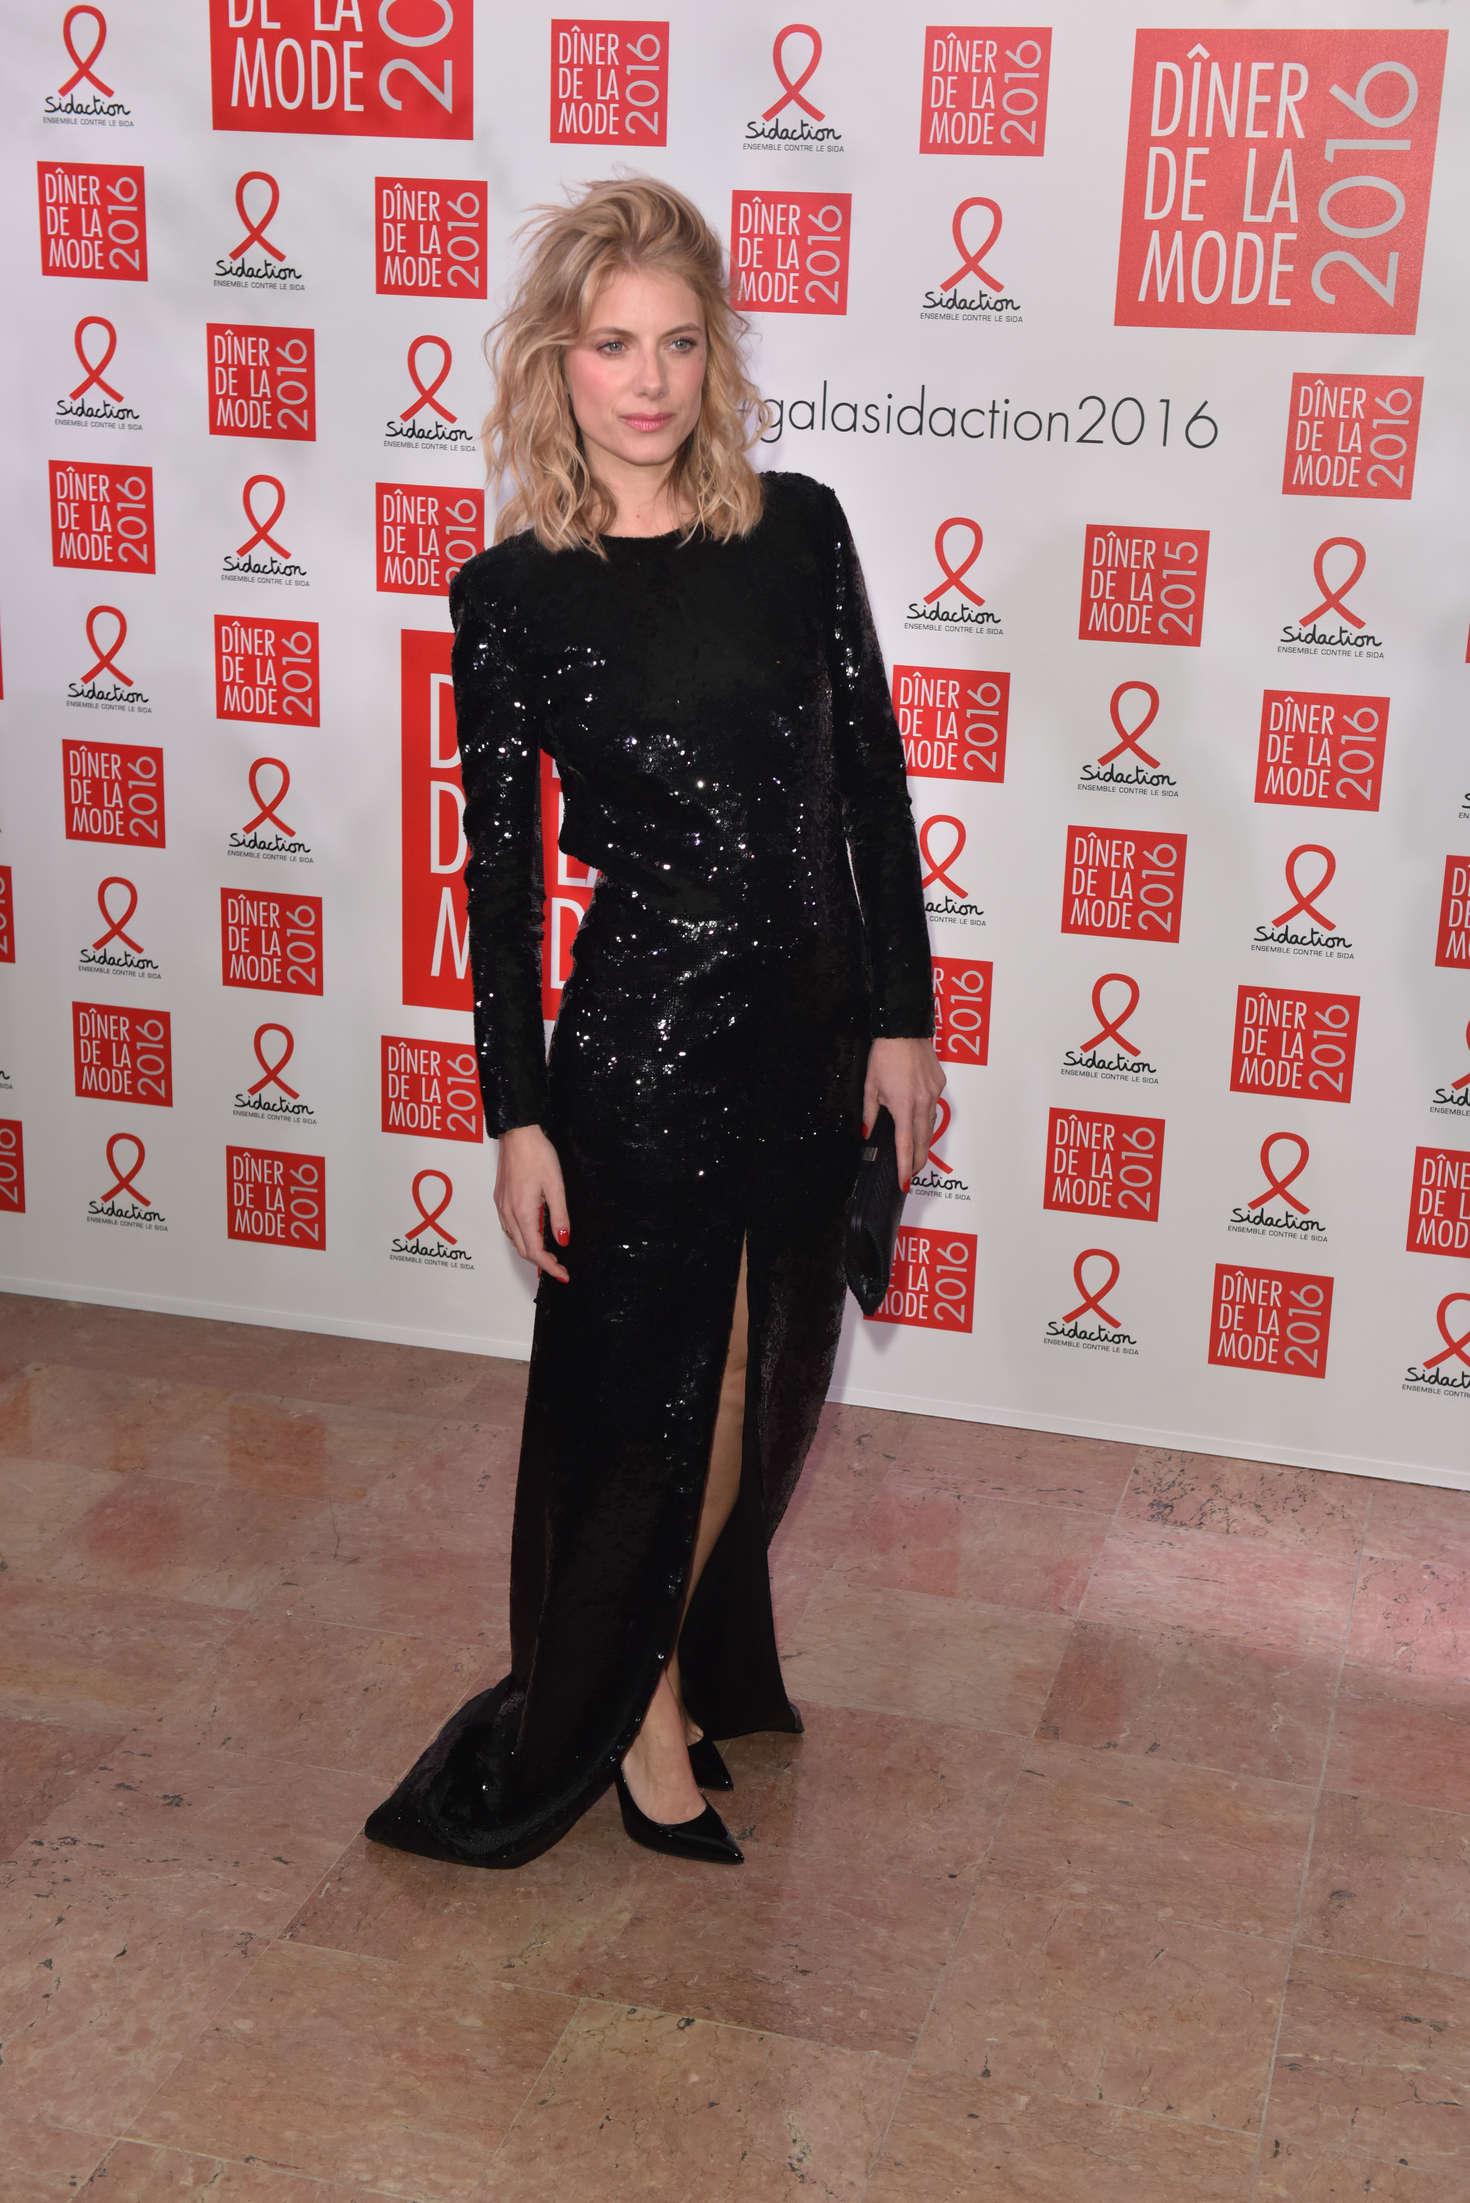 Melanie Laurent 2016 : Melanie Laurent: Sidaction Gala Dinner 2016 -01